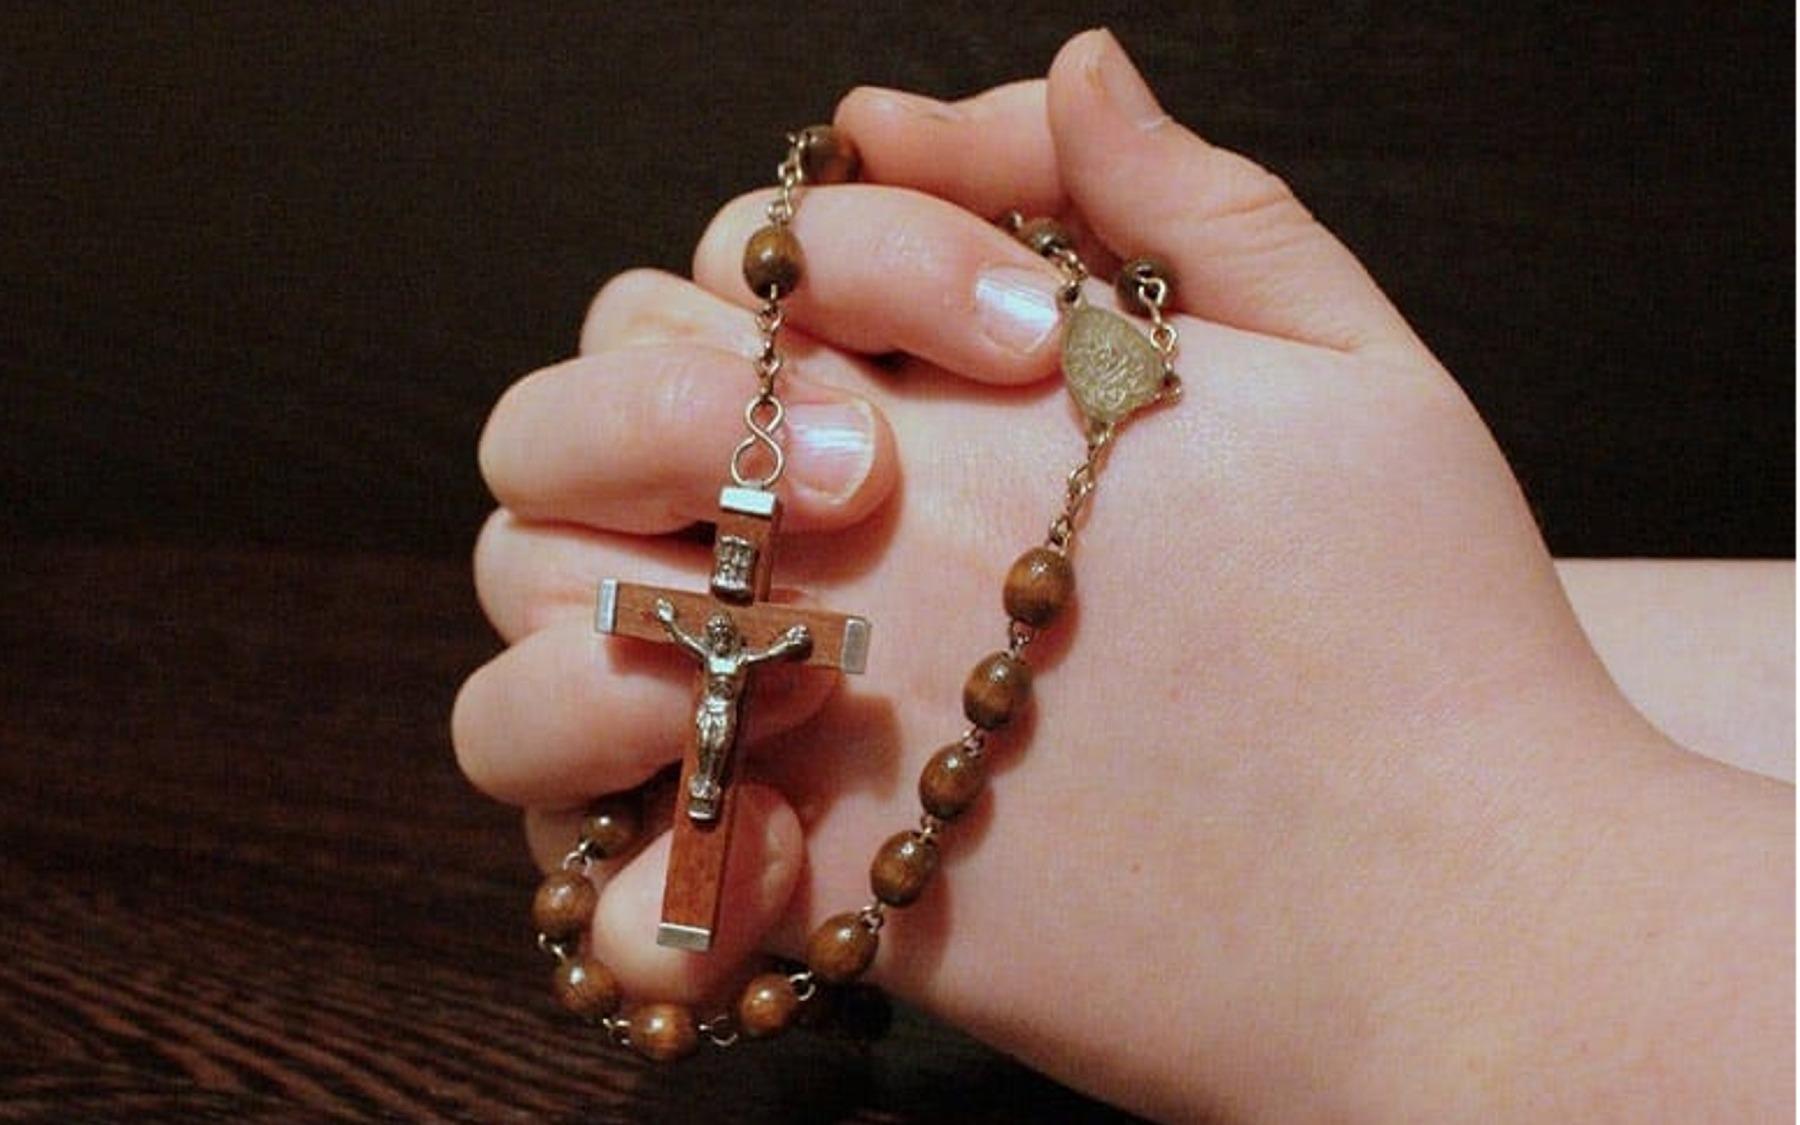 St. Louis - Filler Praying Hands